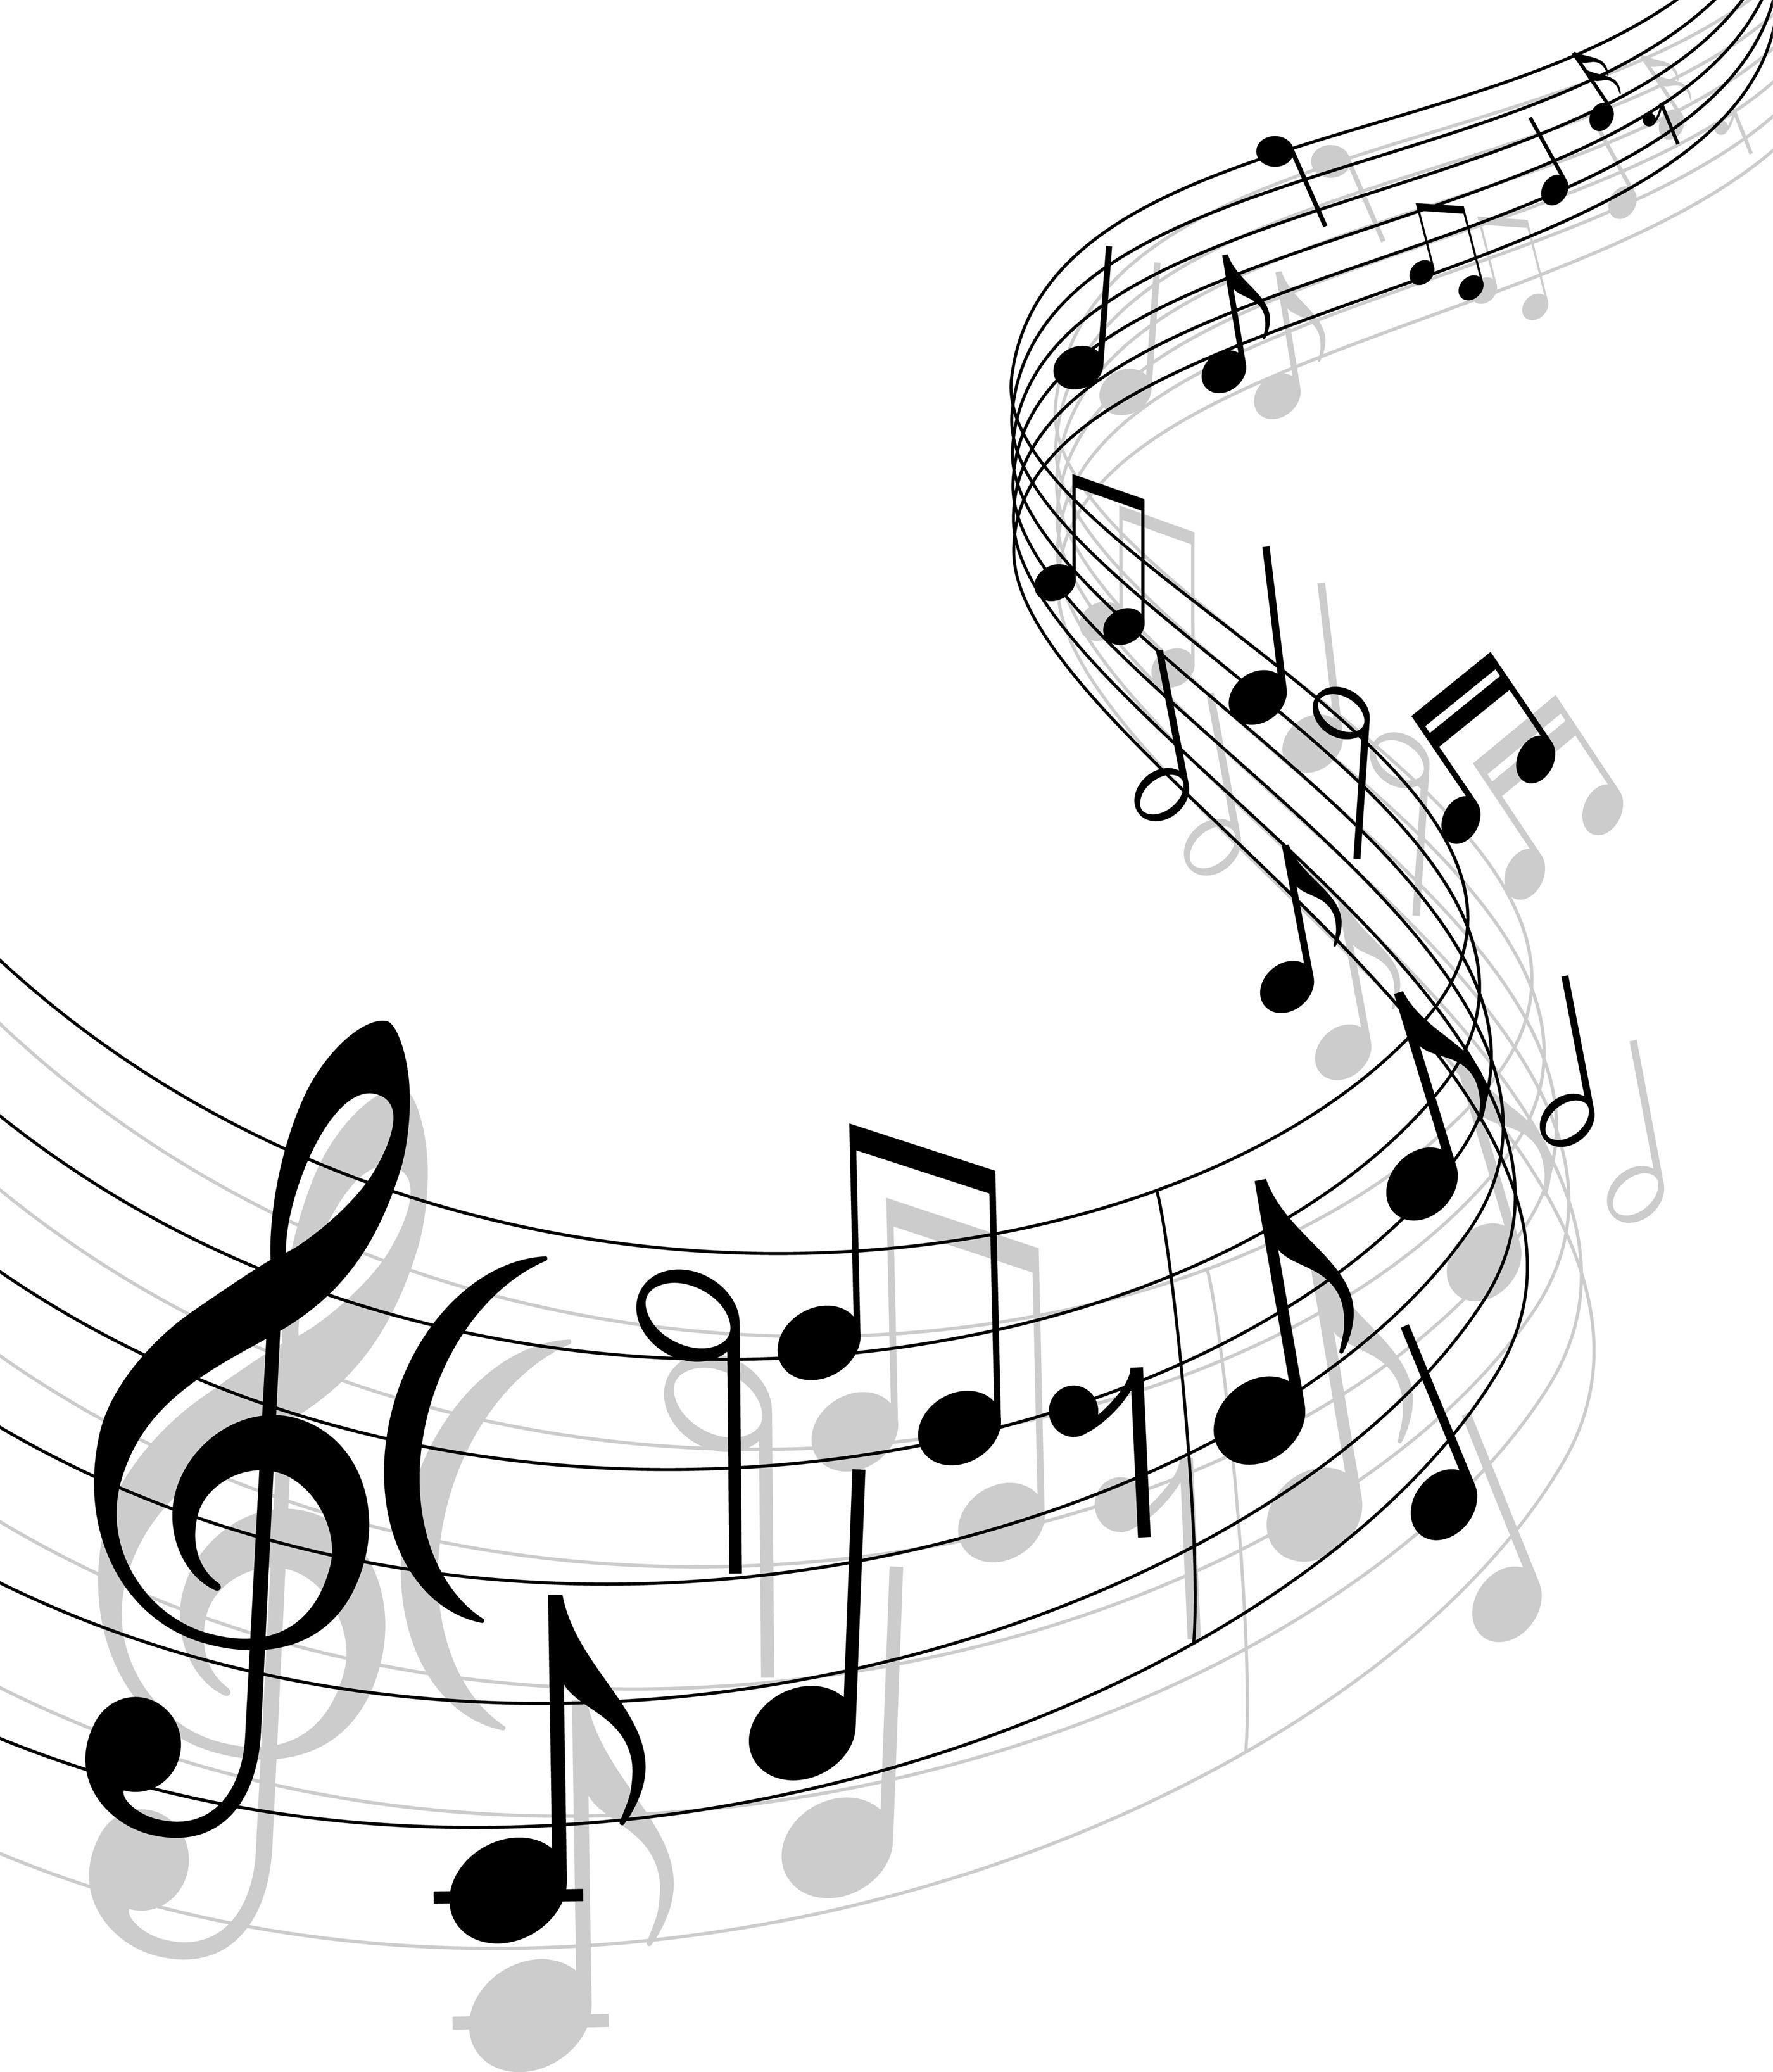 Music notes clip art full hd pics musical notations music notes clip art full hd pics biocorpaavc